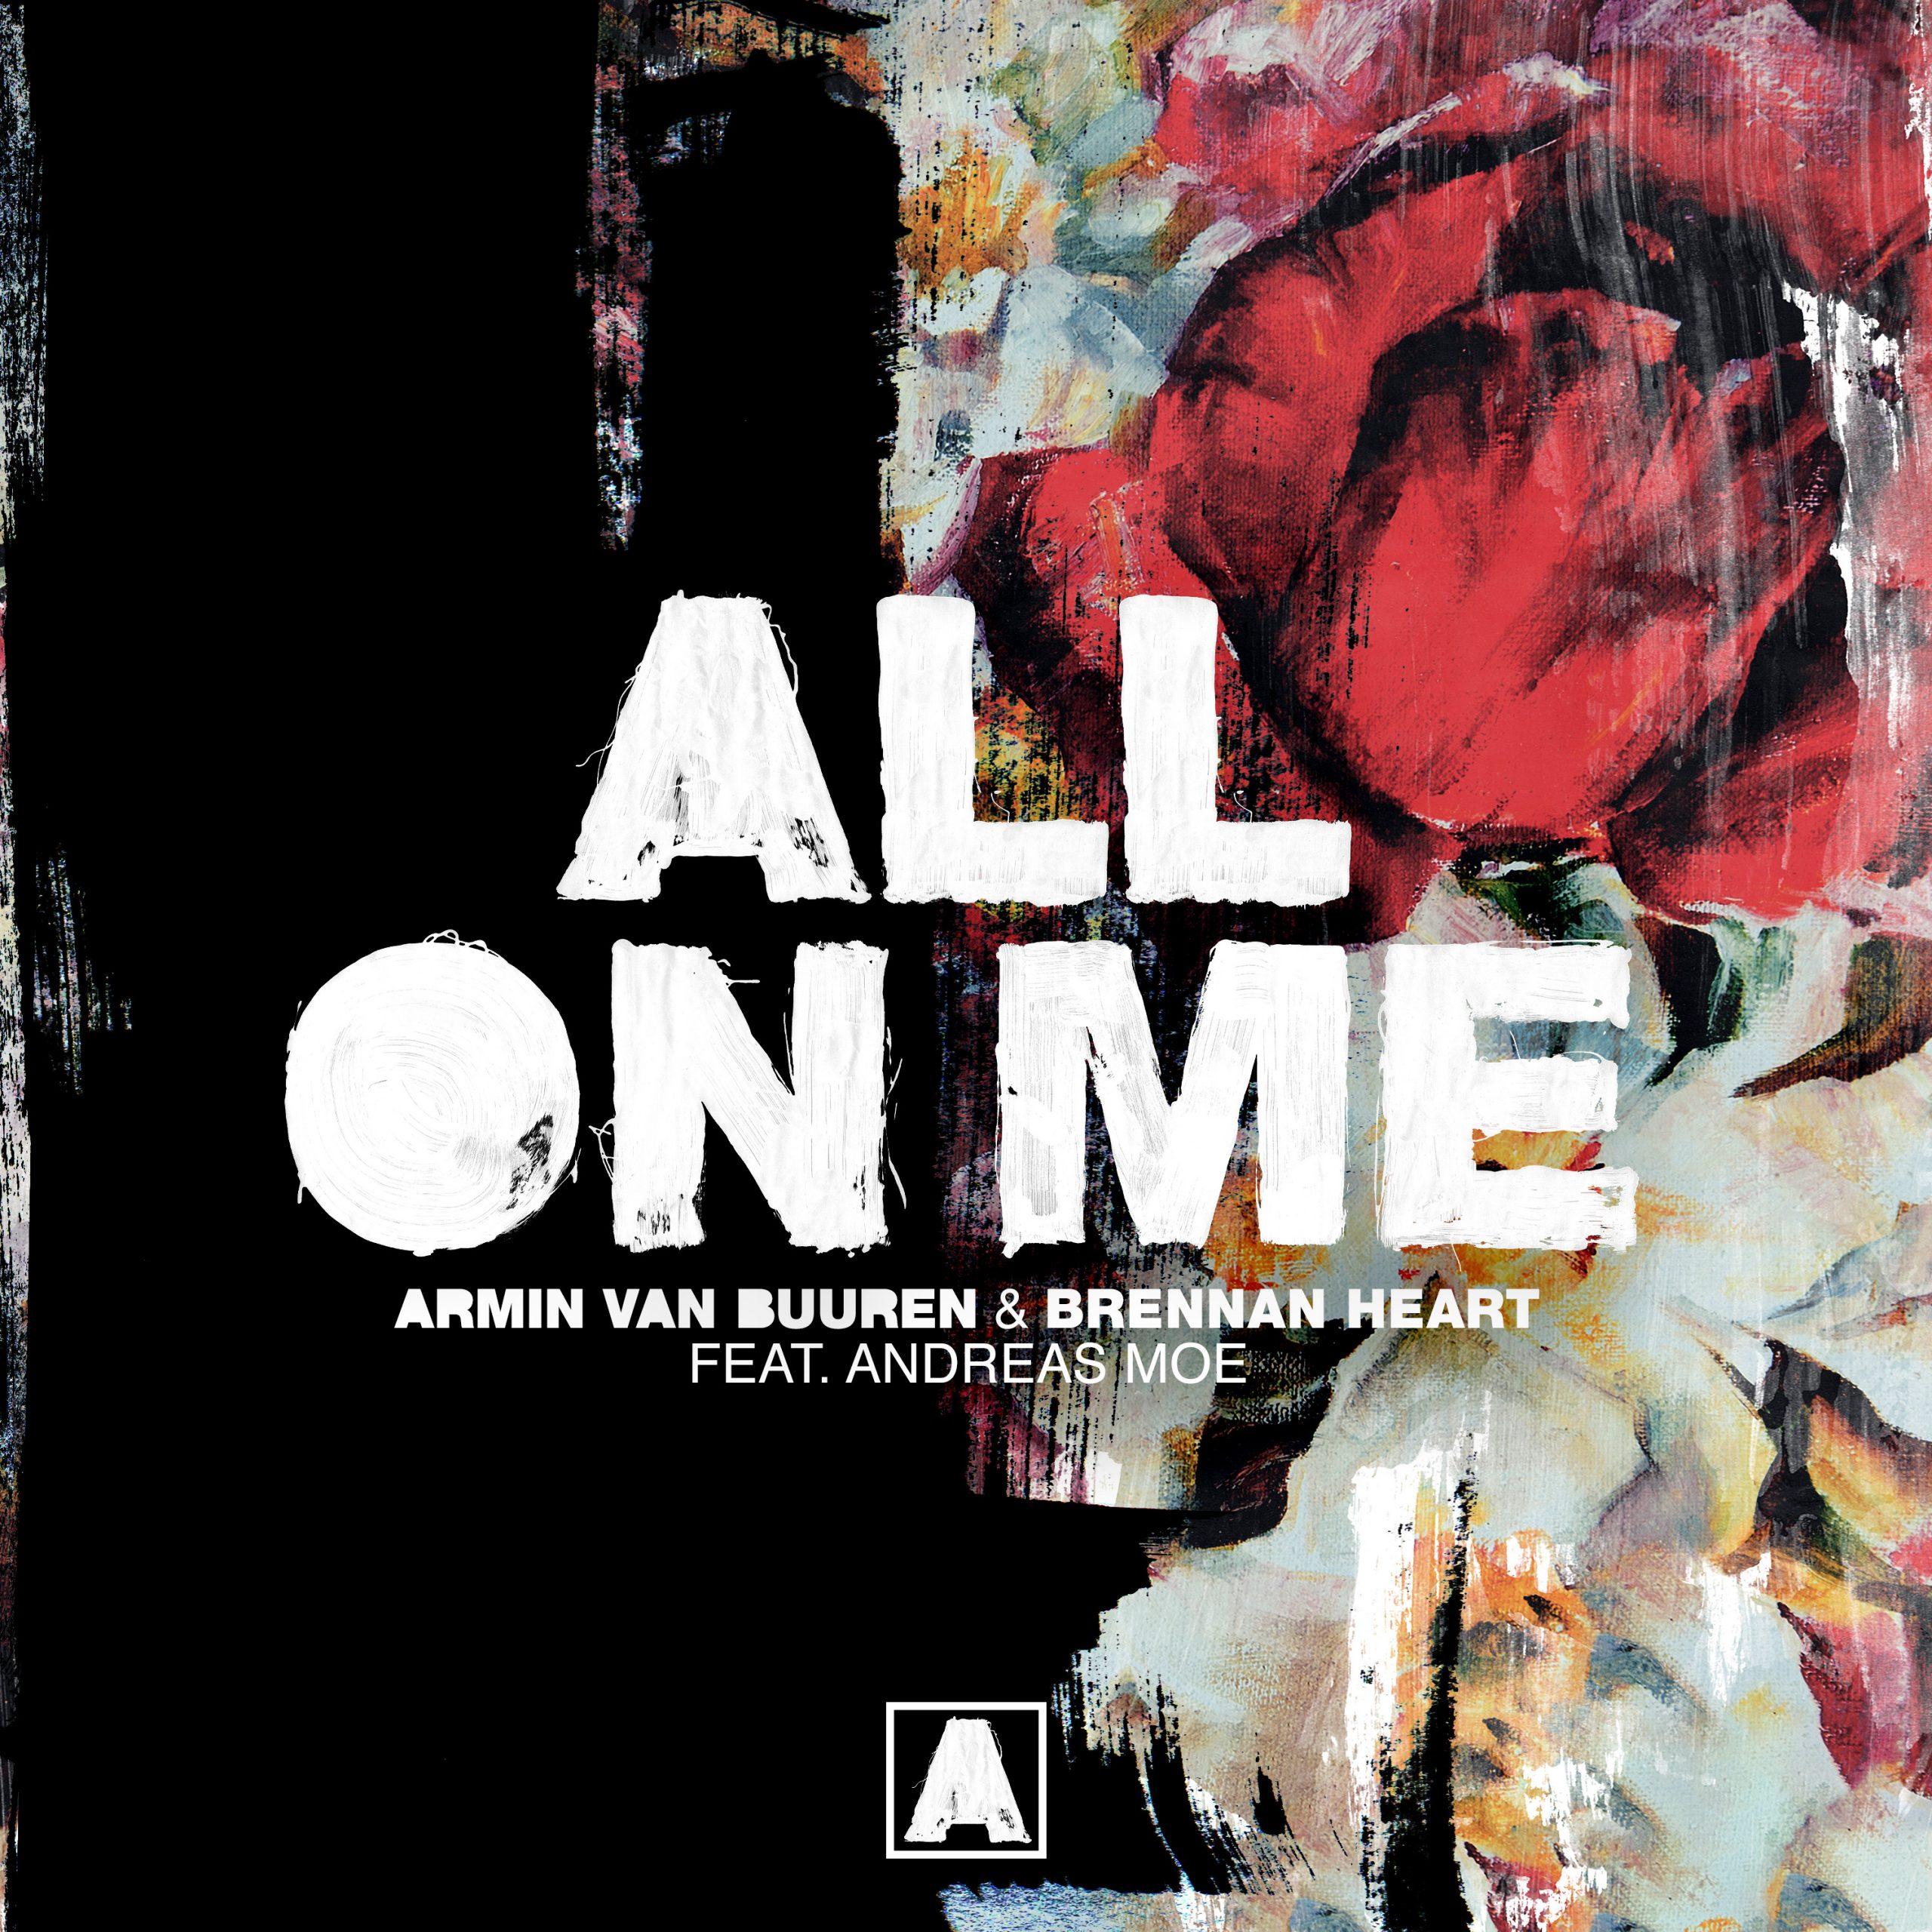 Armin van Buuren Brennan Heart All On Me Featuring Andreas Moe